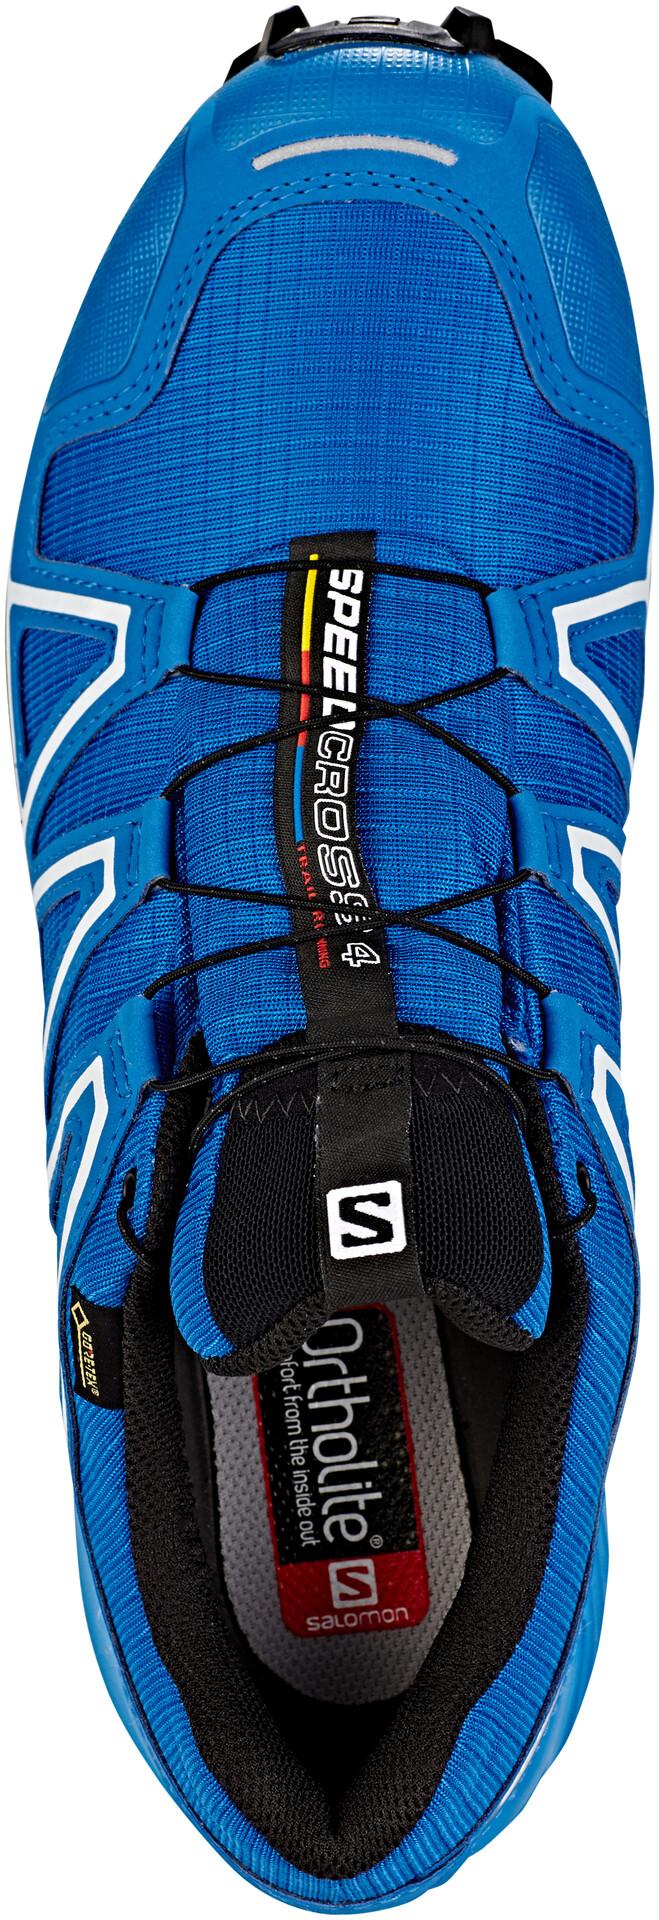 Salomon Speedcross 4 GTX Shoes Herre sky diverindigo buntingblack